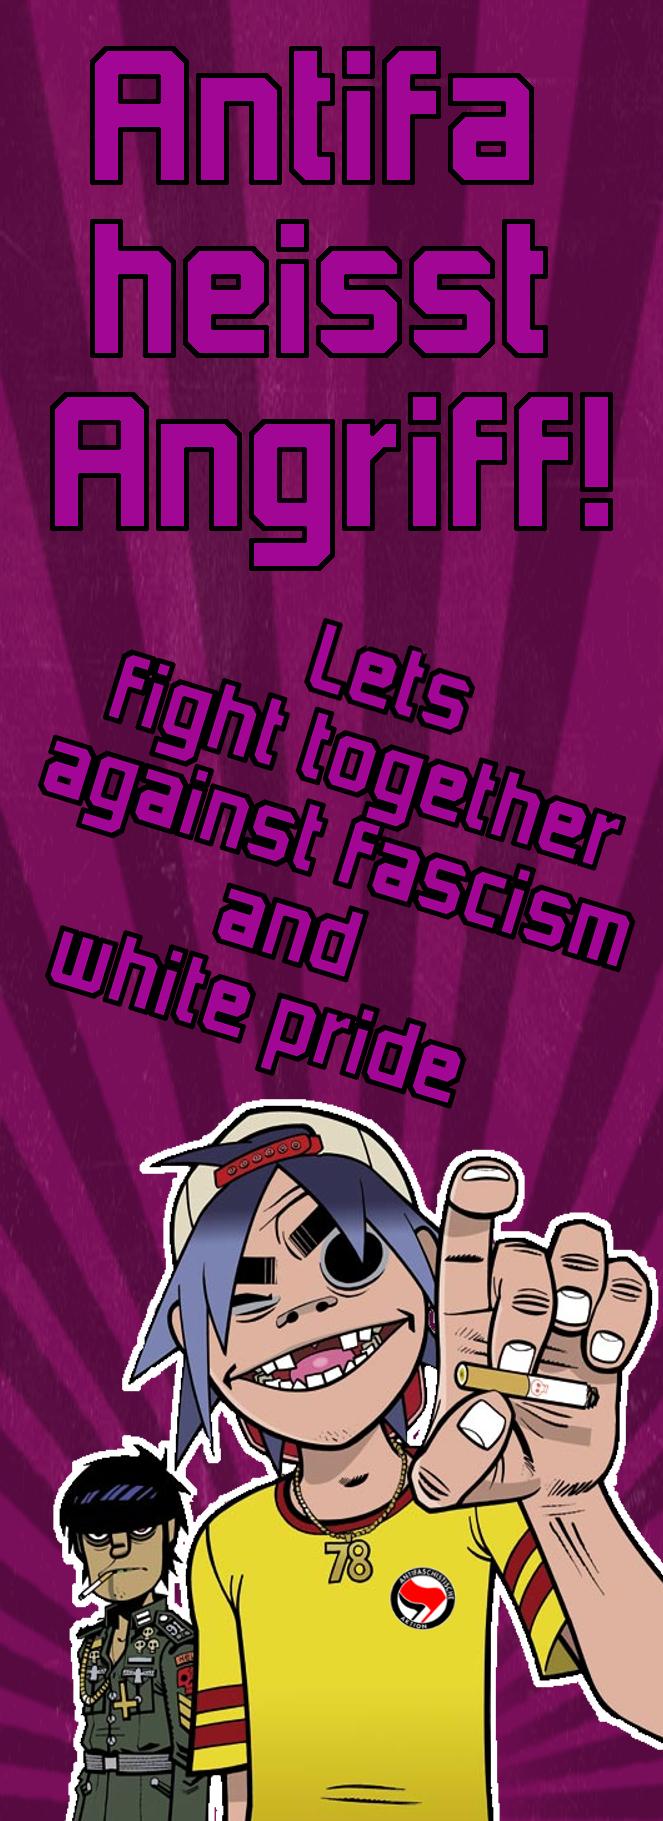 http://aargb.blogsport.de/images/antifa_sticker_lang.png